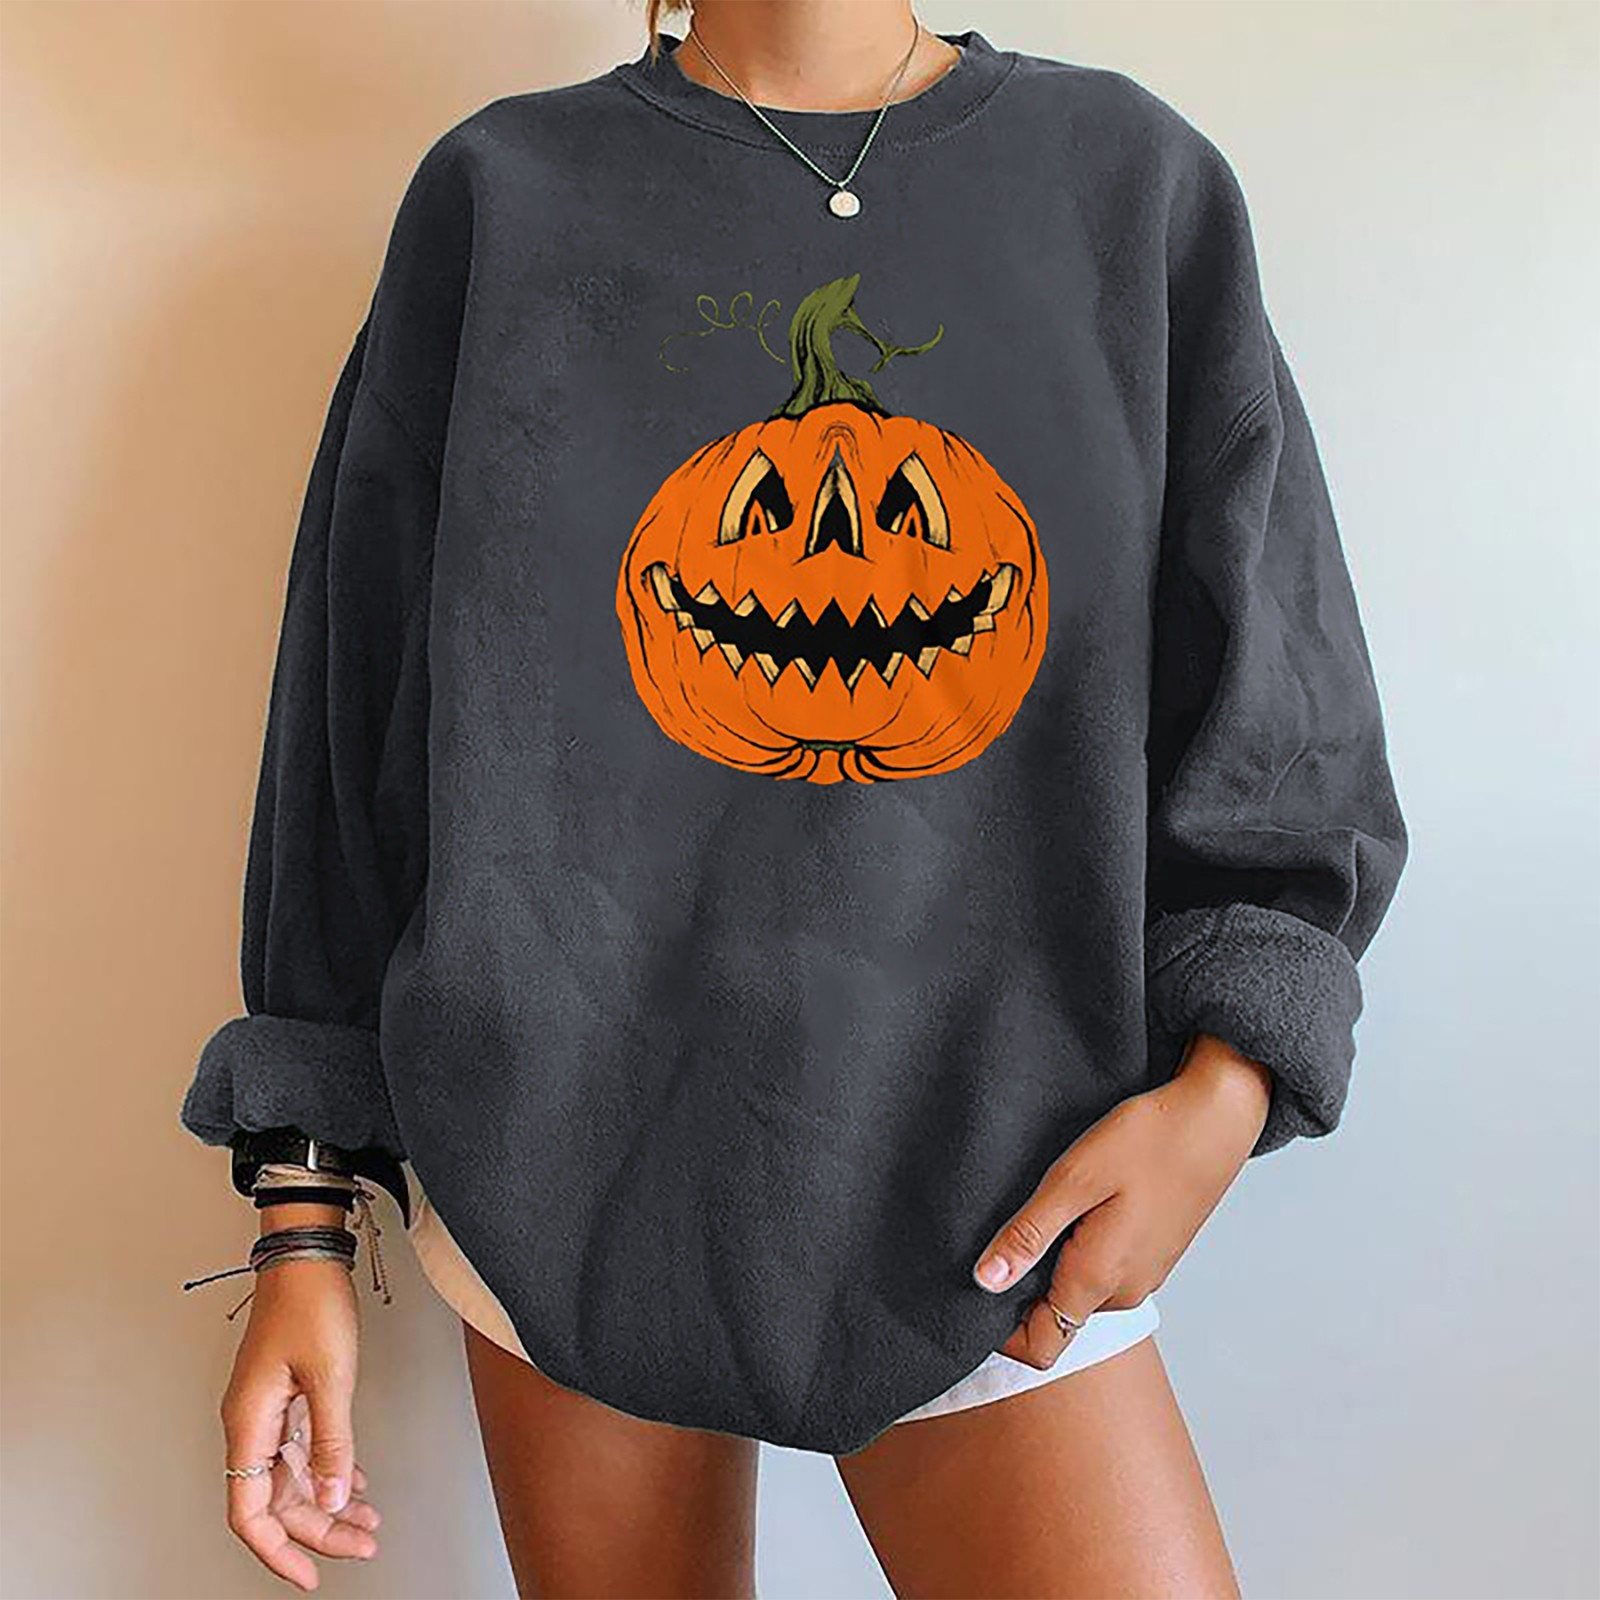 Women's 2021 Halloween Pumpkin Print T-Shirts Casual Long Sleeve Tops Shirts Loose O-Neck Female Tee poleras mujer